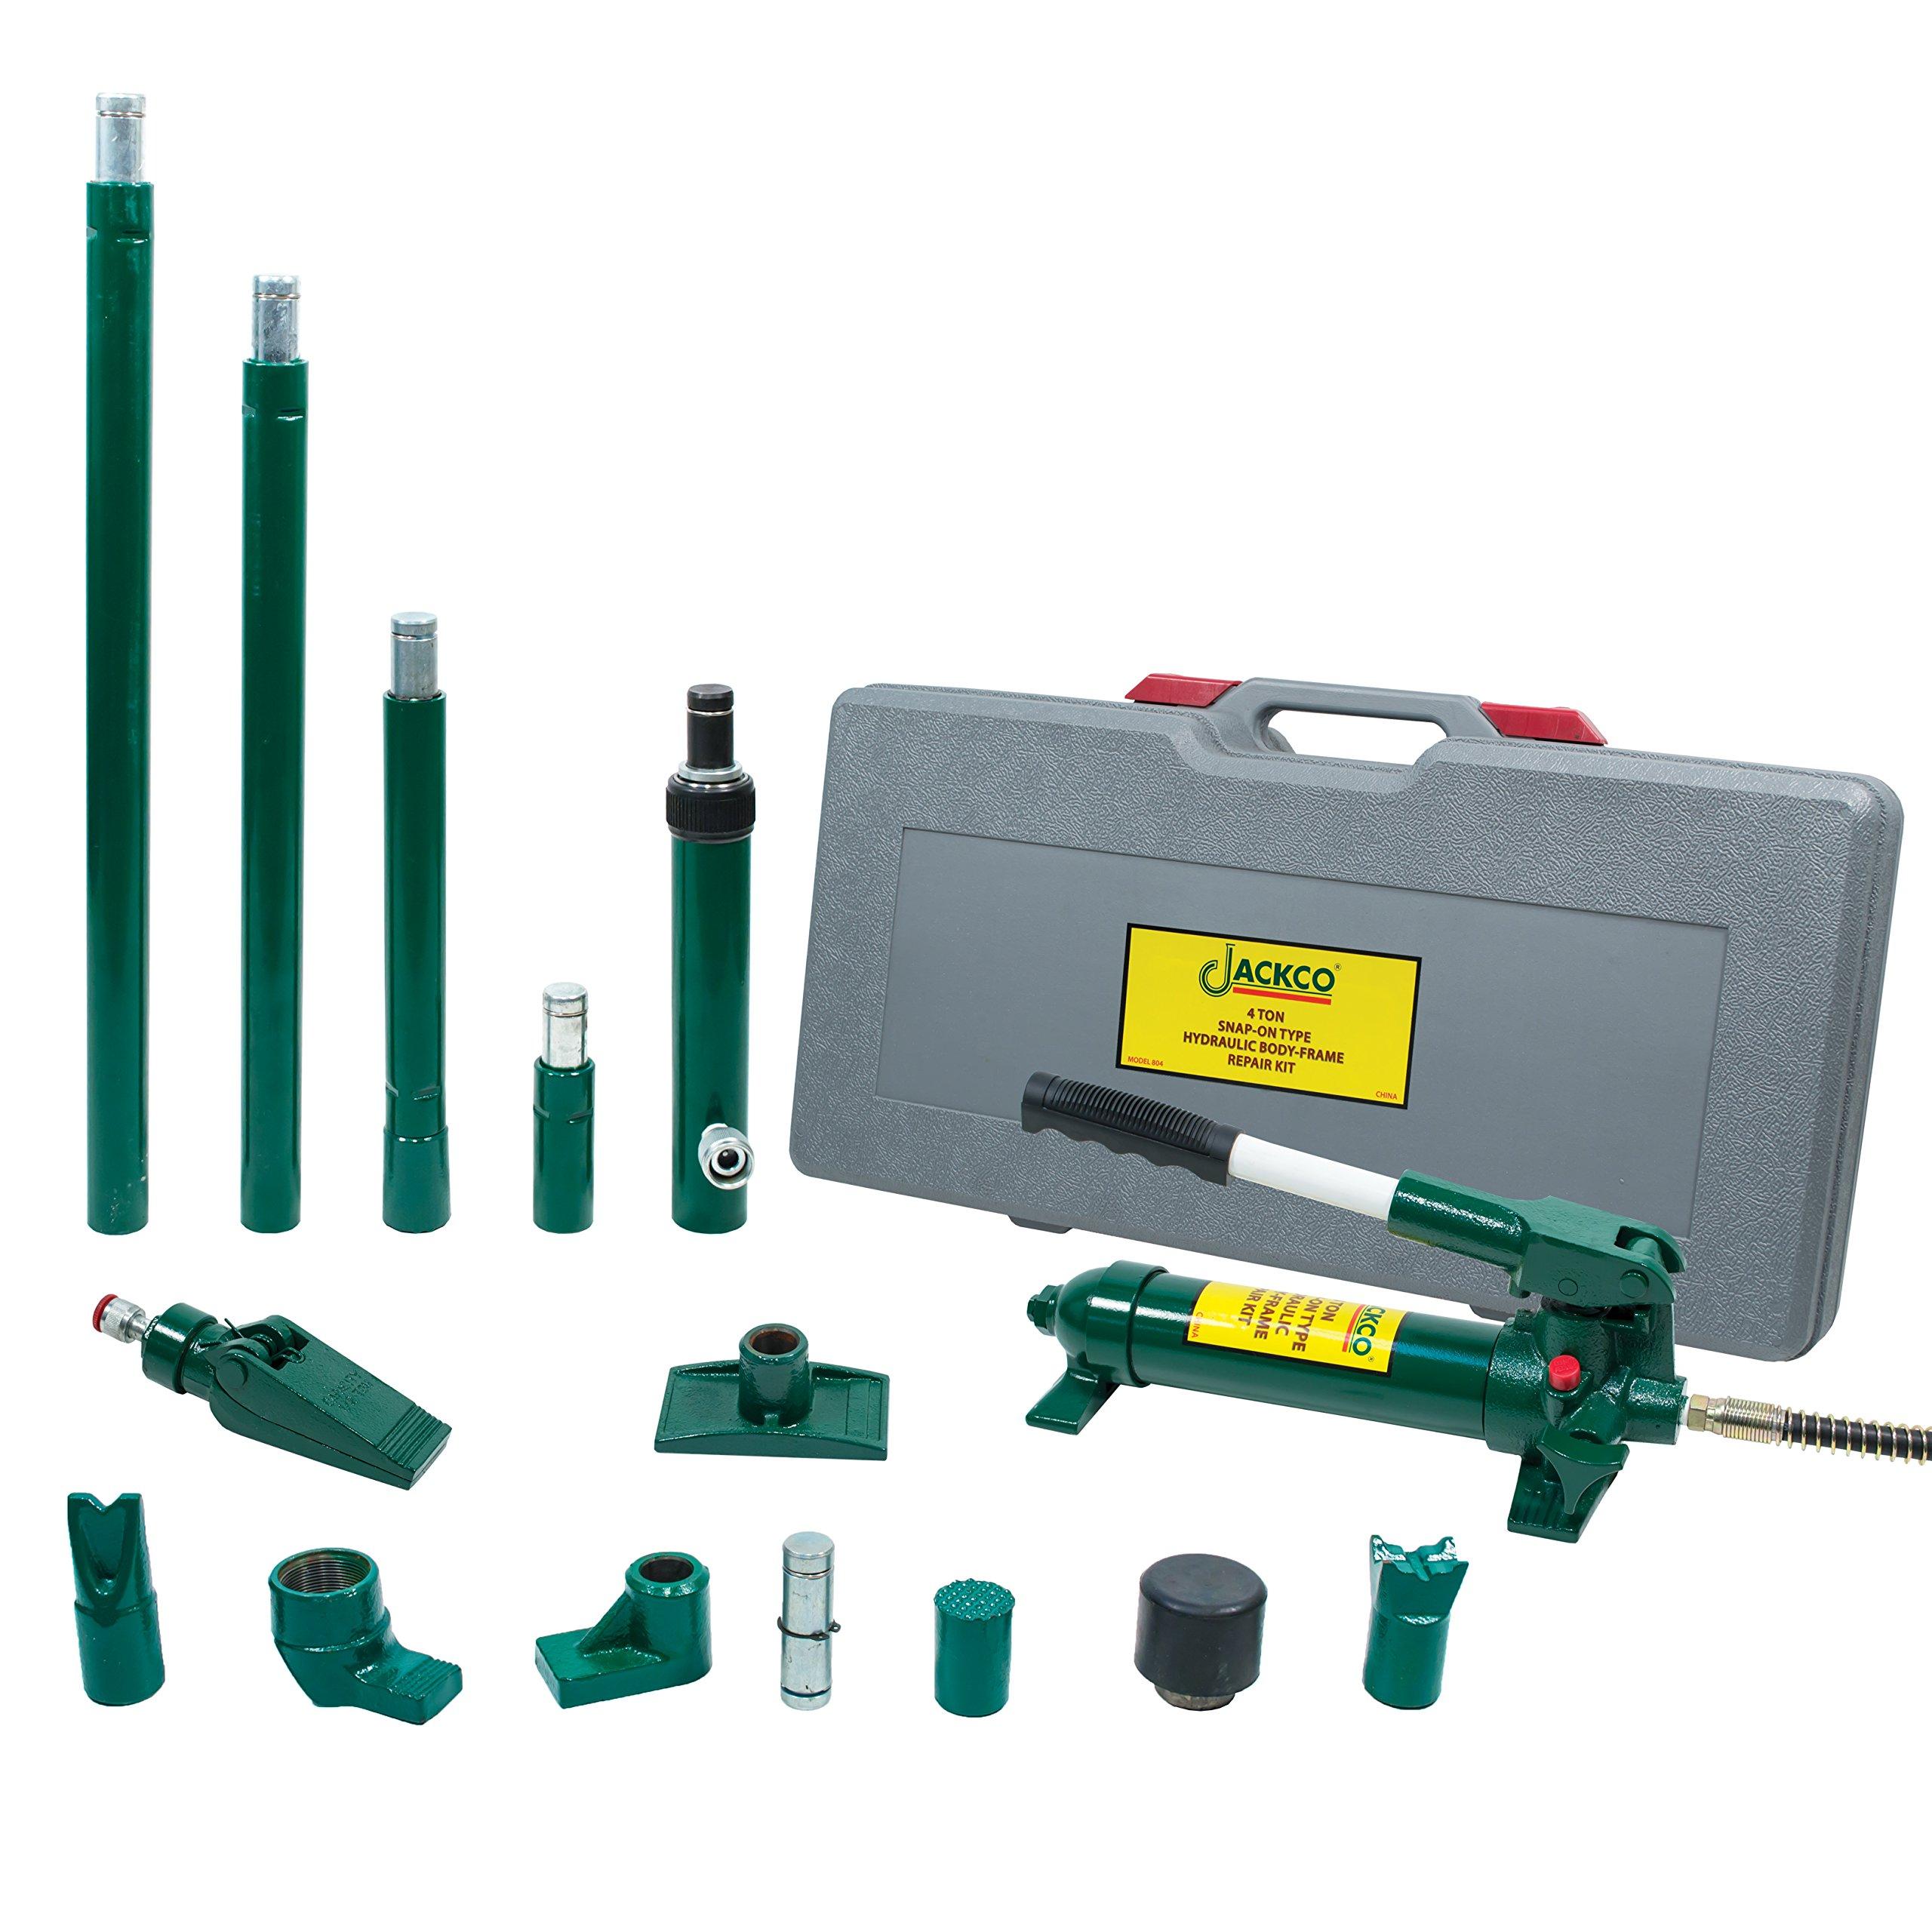 Jackco 4 Ton Snap-on Type Hydraulic Body Frame Repair Kit